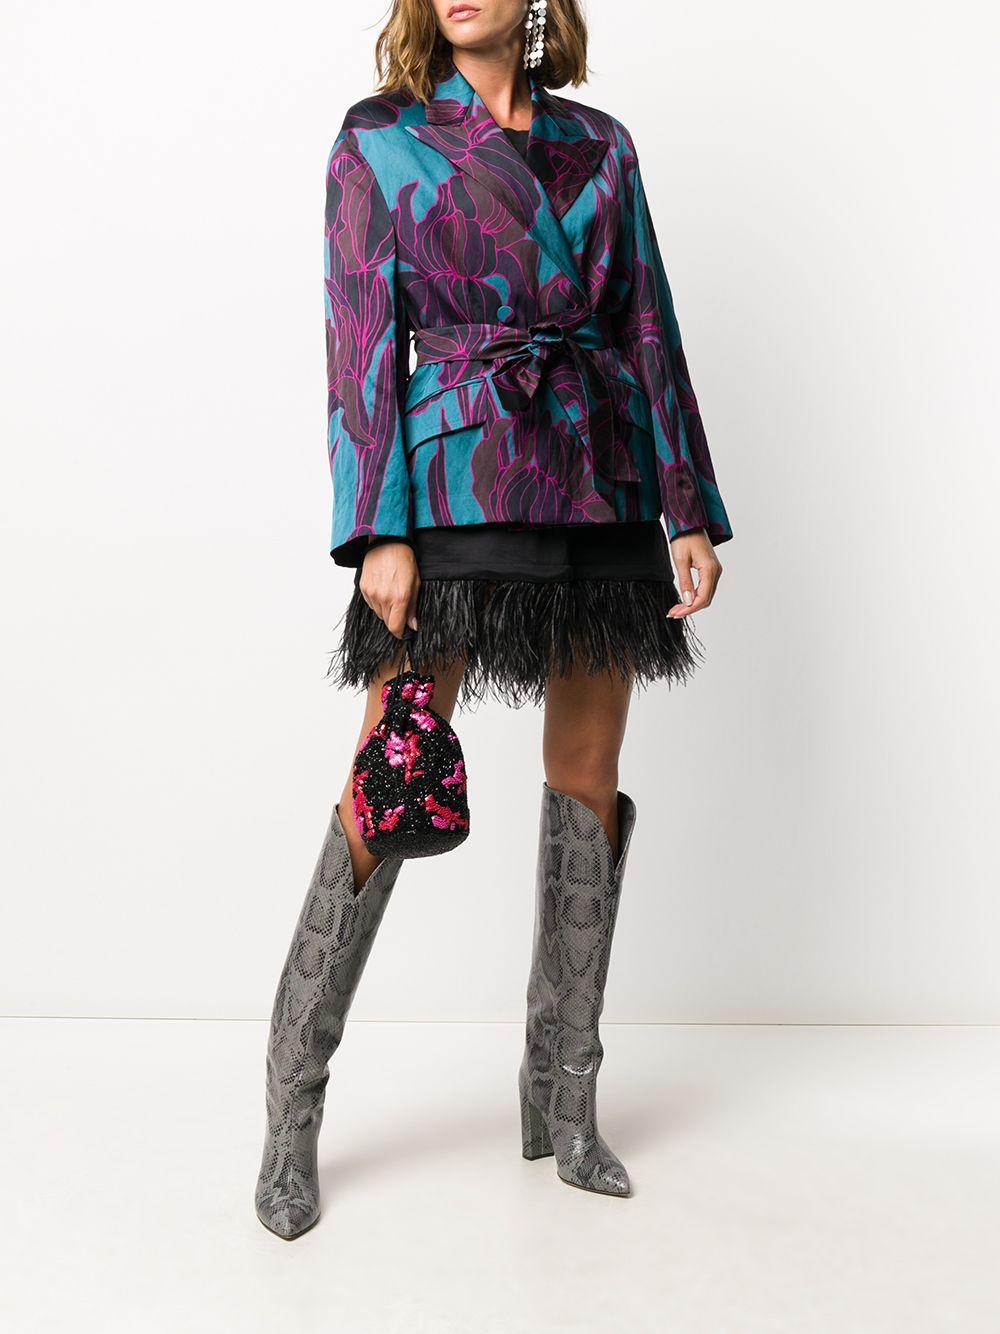 Blazer Bouncy in misto cotone blu petrolio e viola con cintura e stampa floreale DRIES VAN NOTEN | Giacche | BOUNCY BIS-1353508